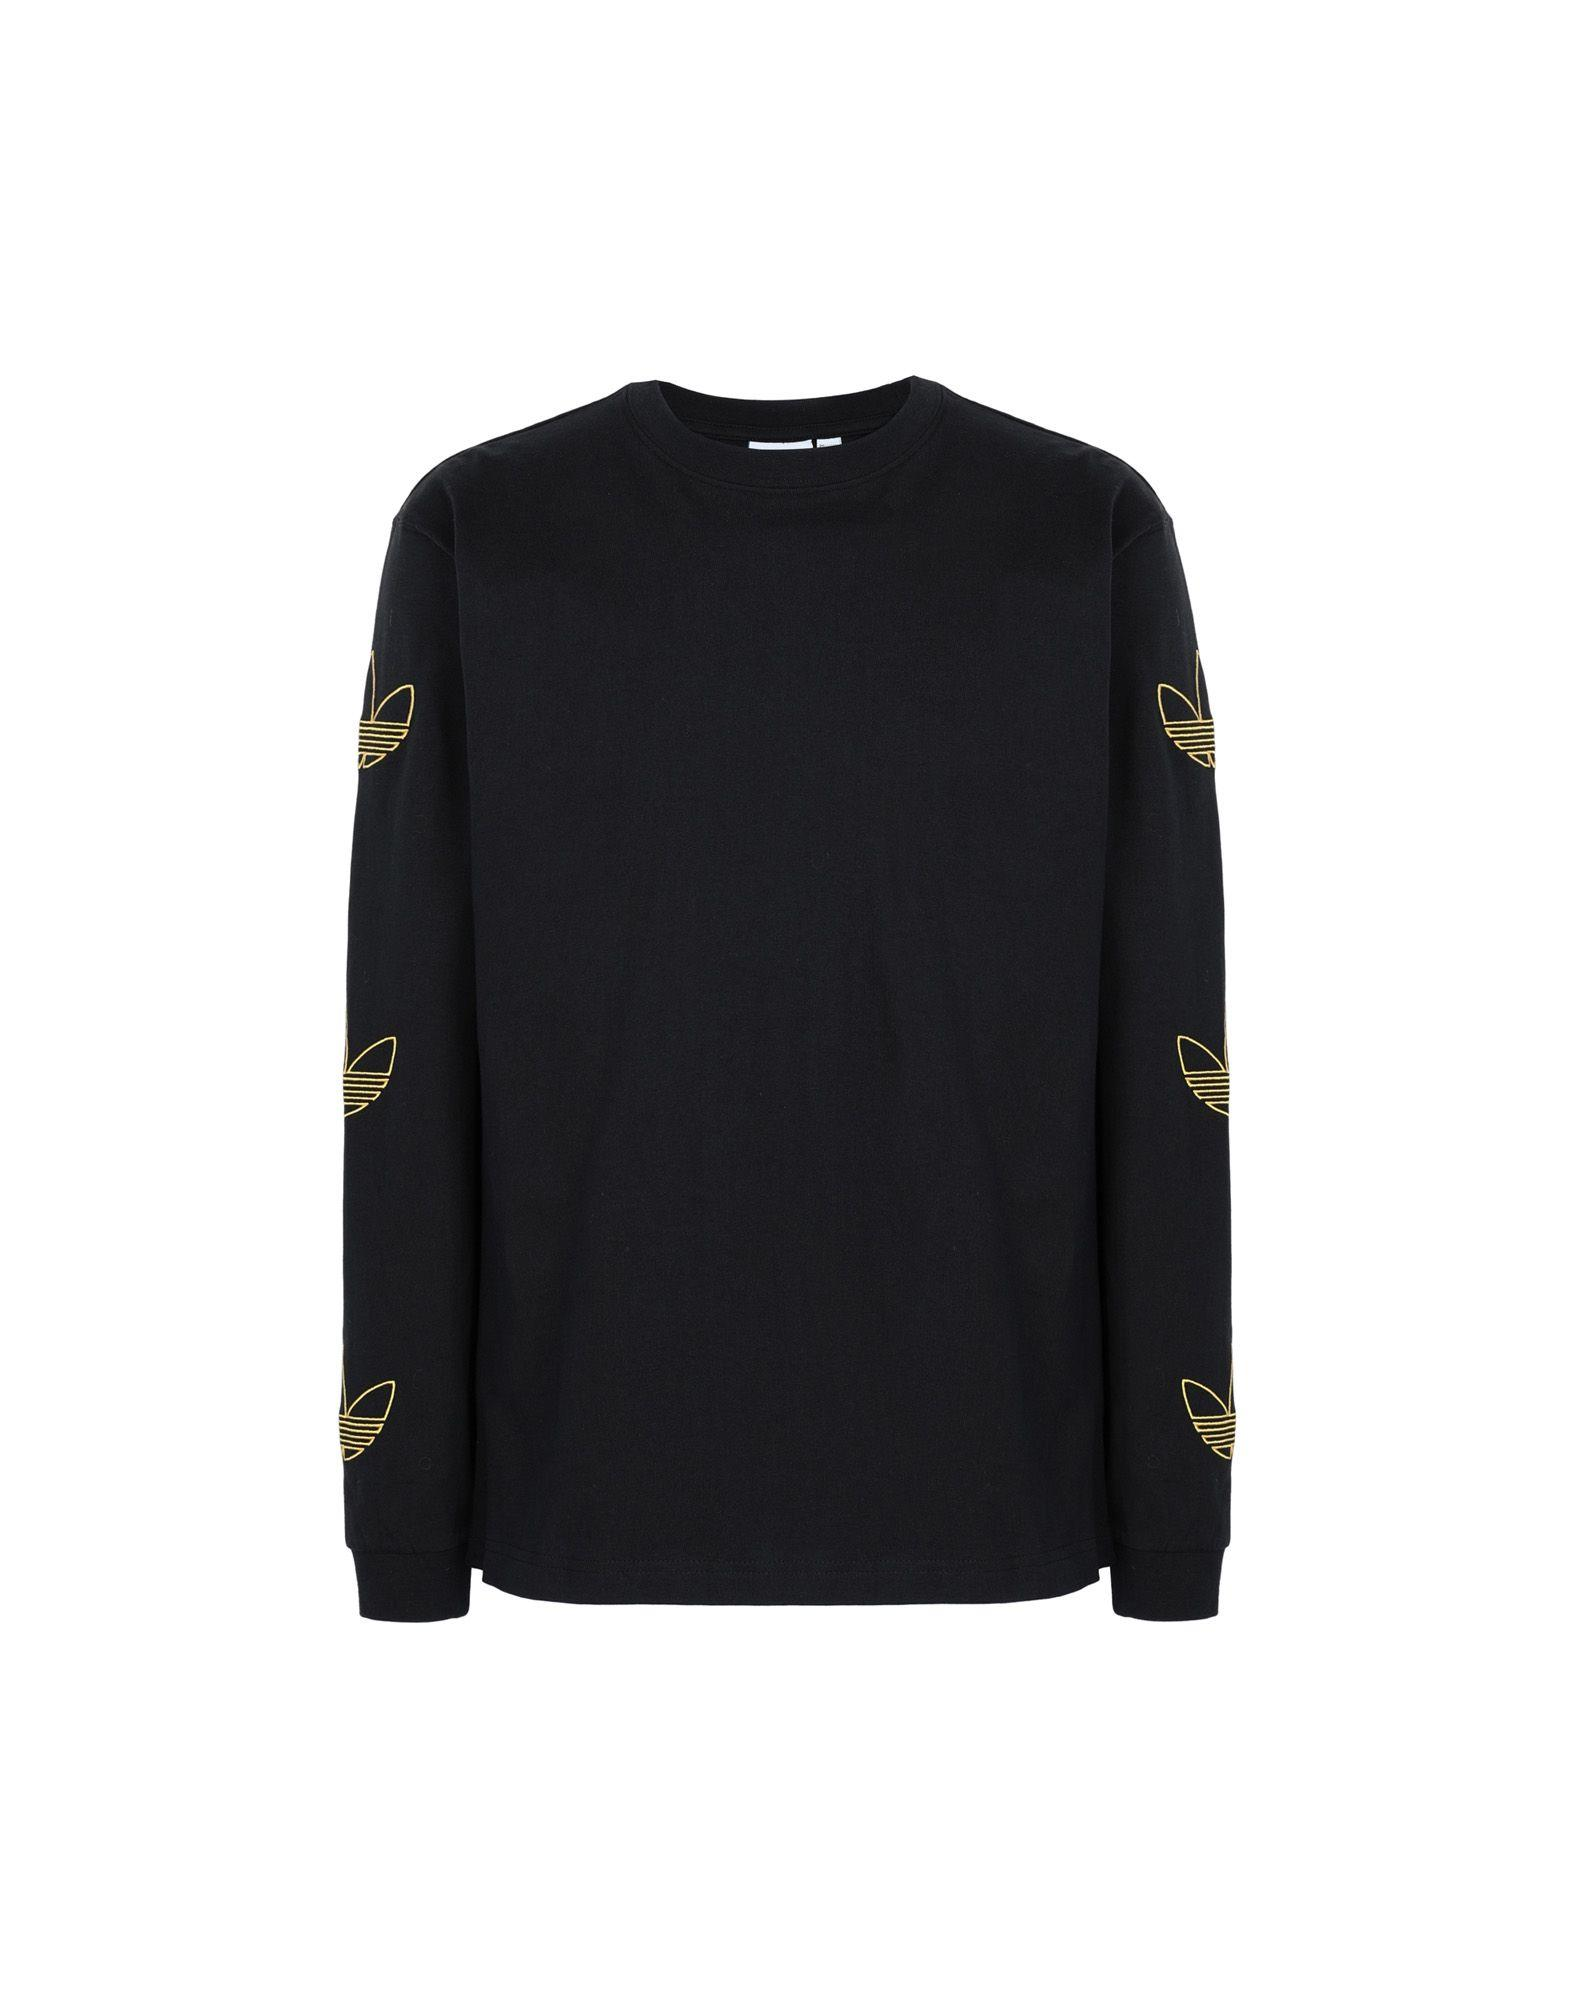 51fcb895 adidas Originals T-shirt in Black for Men - Lyst